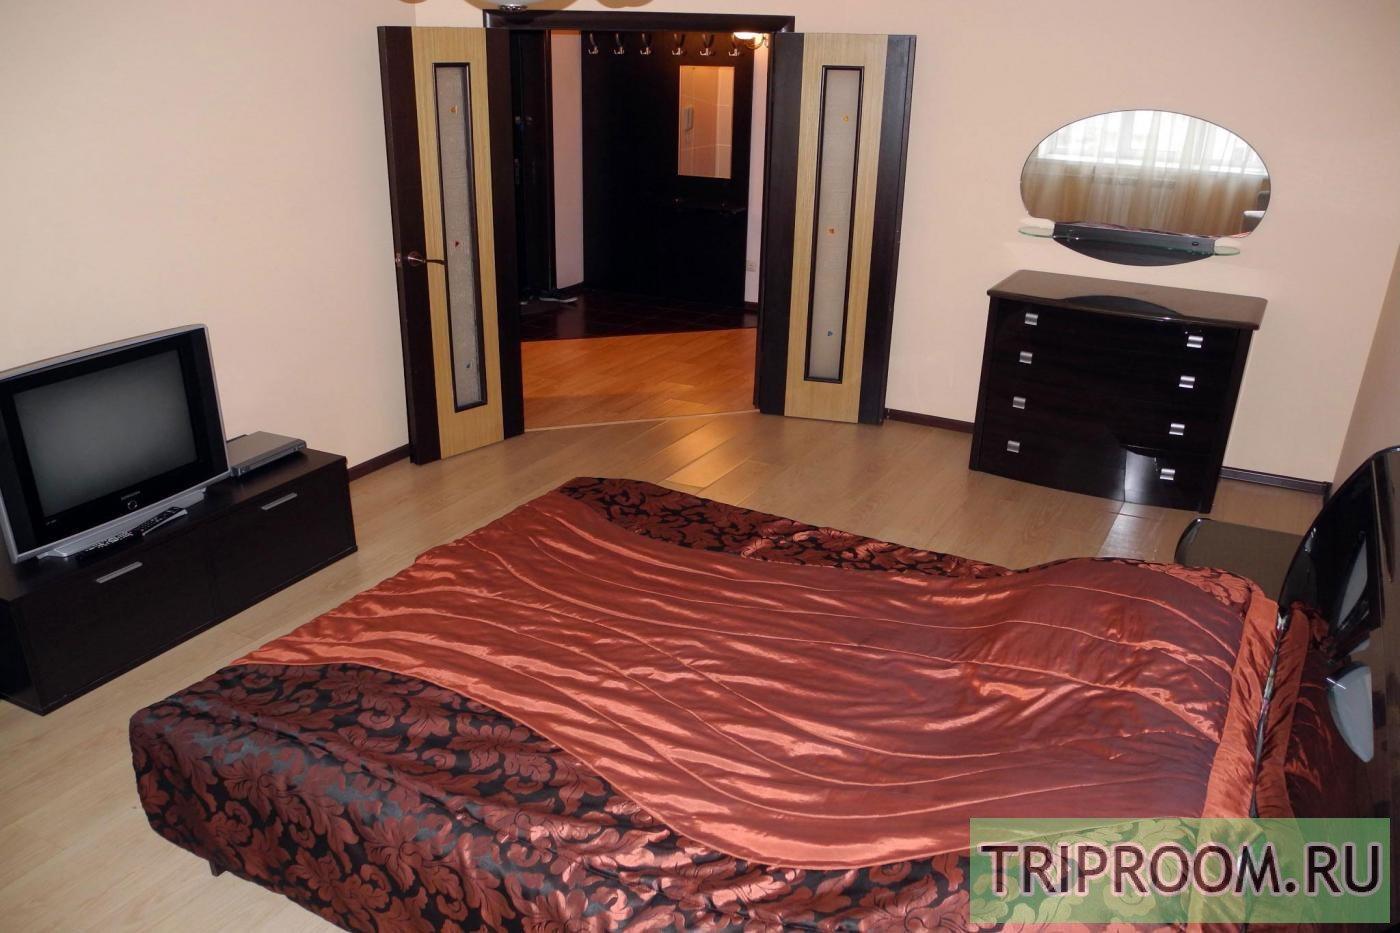 2-комнатная квартира посуточно (вариант № 3876), ул. Войкова улица, фото № 4